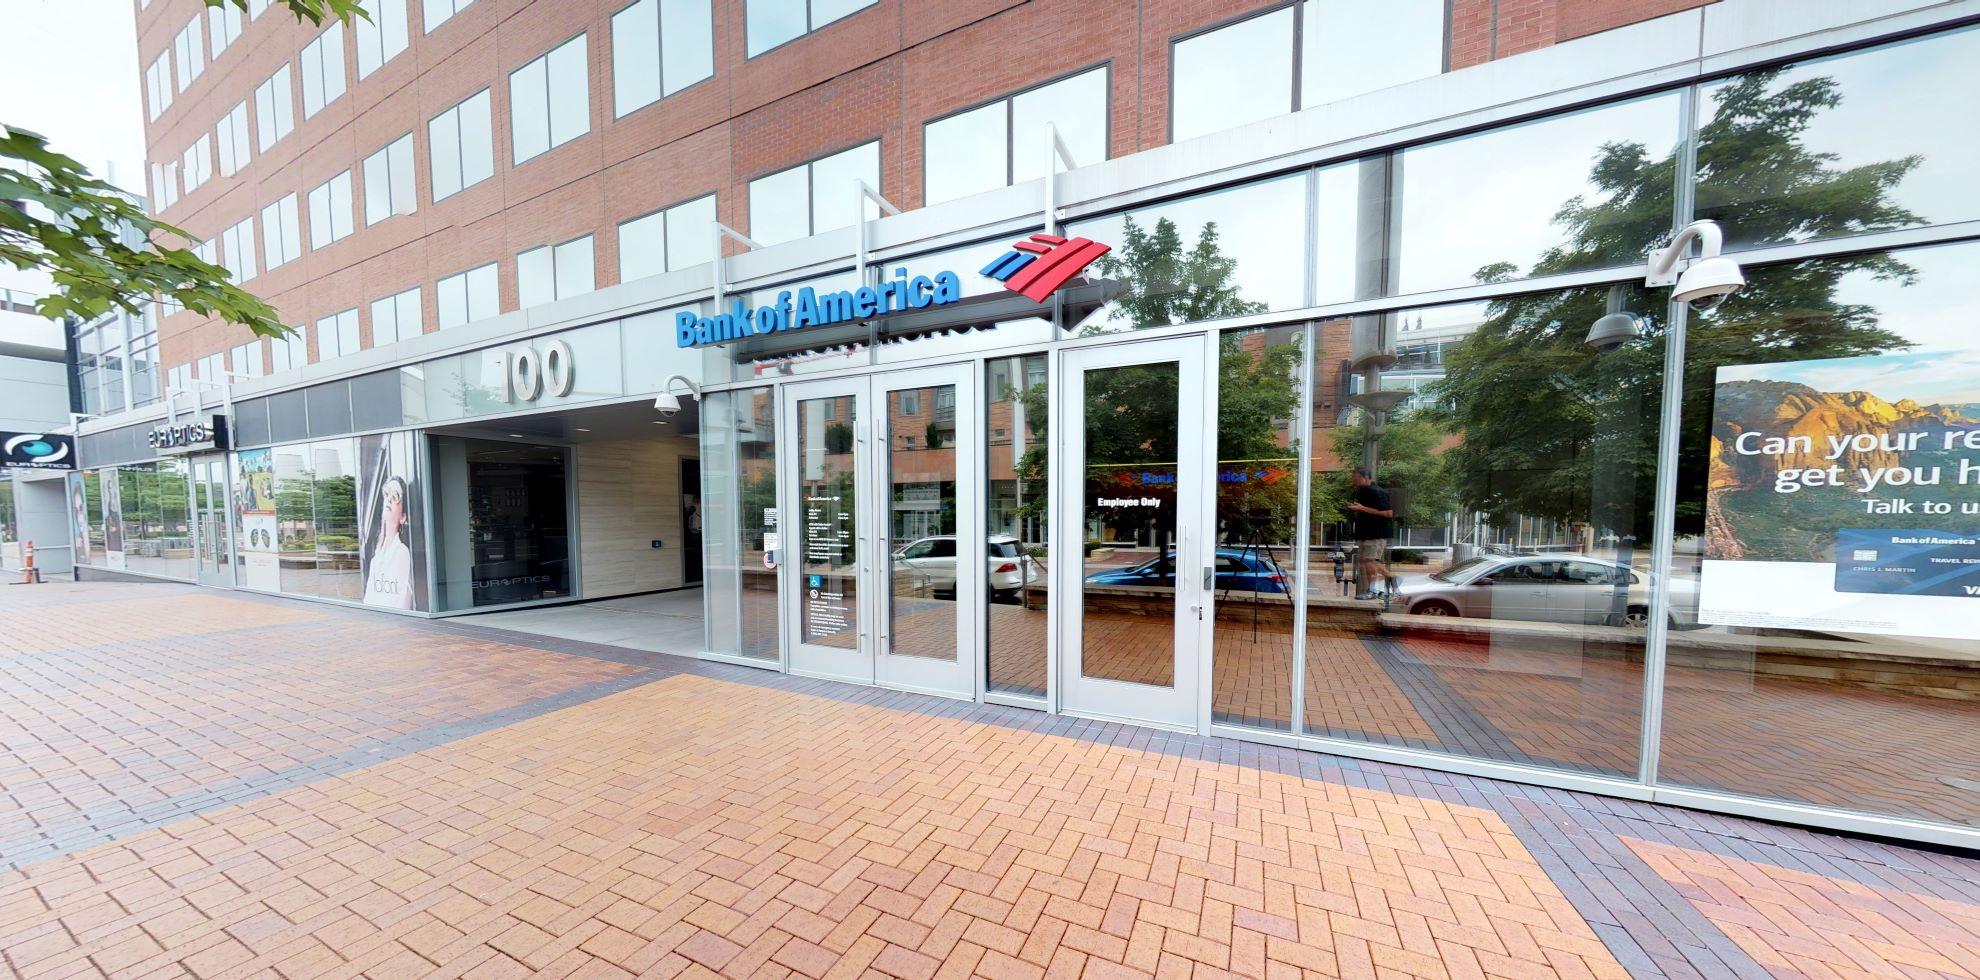 Bank of America financial center with walk-up ATM | 100 Fillmore St STE 100, Denver, CO 80206